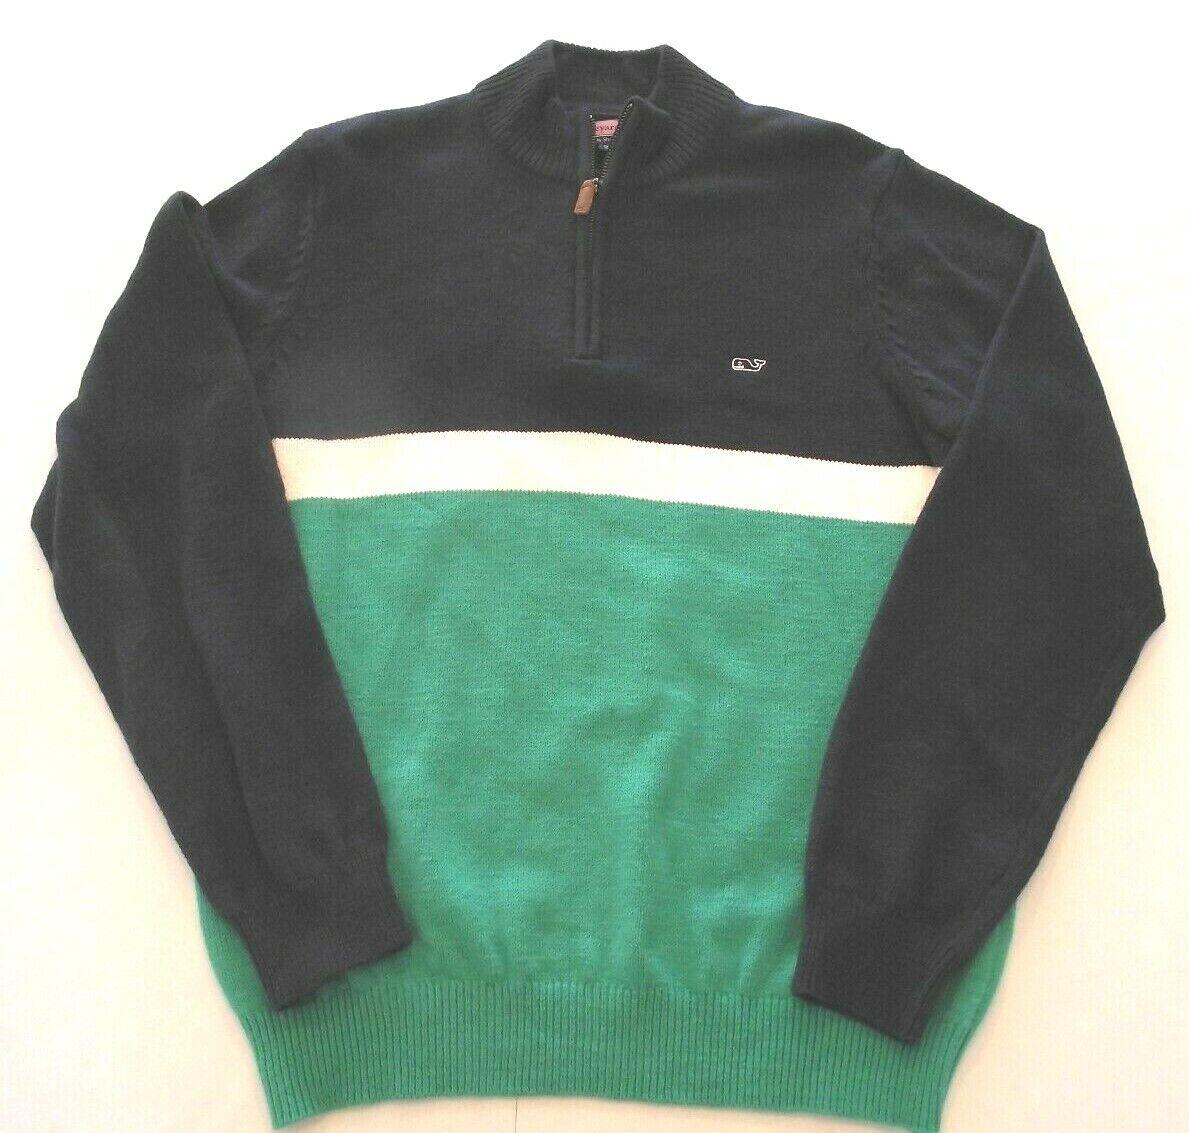 VINEYARD VINES Men's Medium Navy Green Sweater (s)